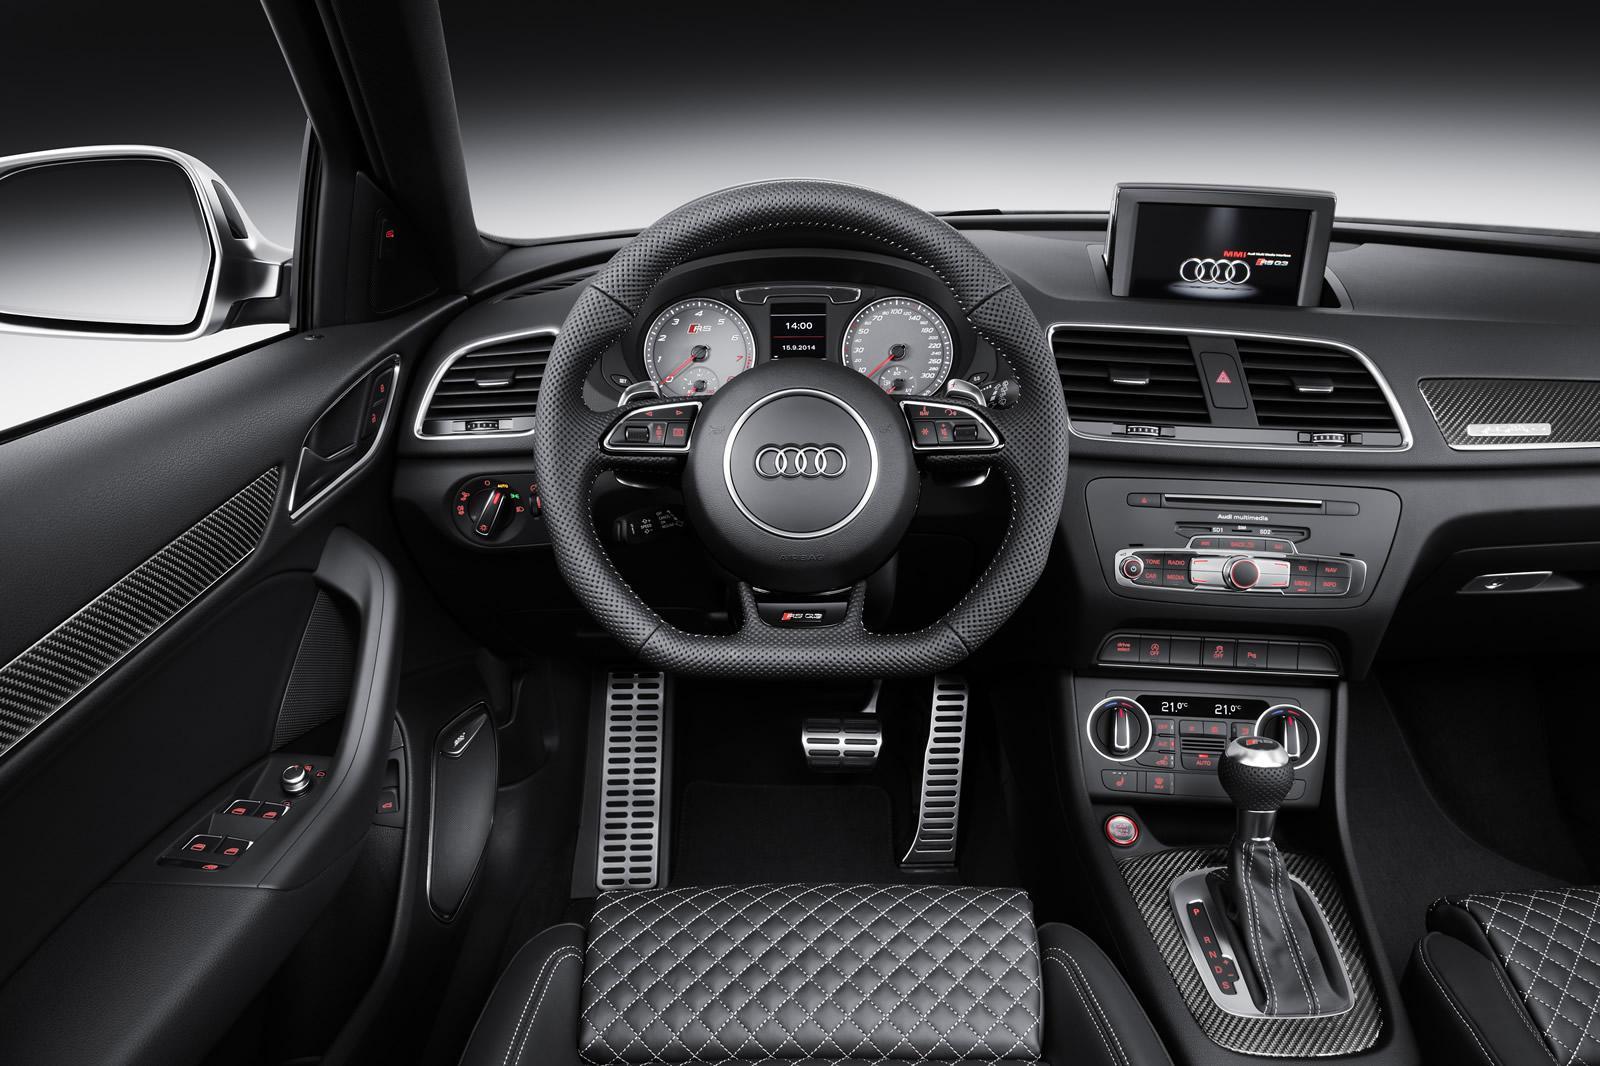 2015 Audi RS Q3 facelift steering wheel